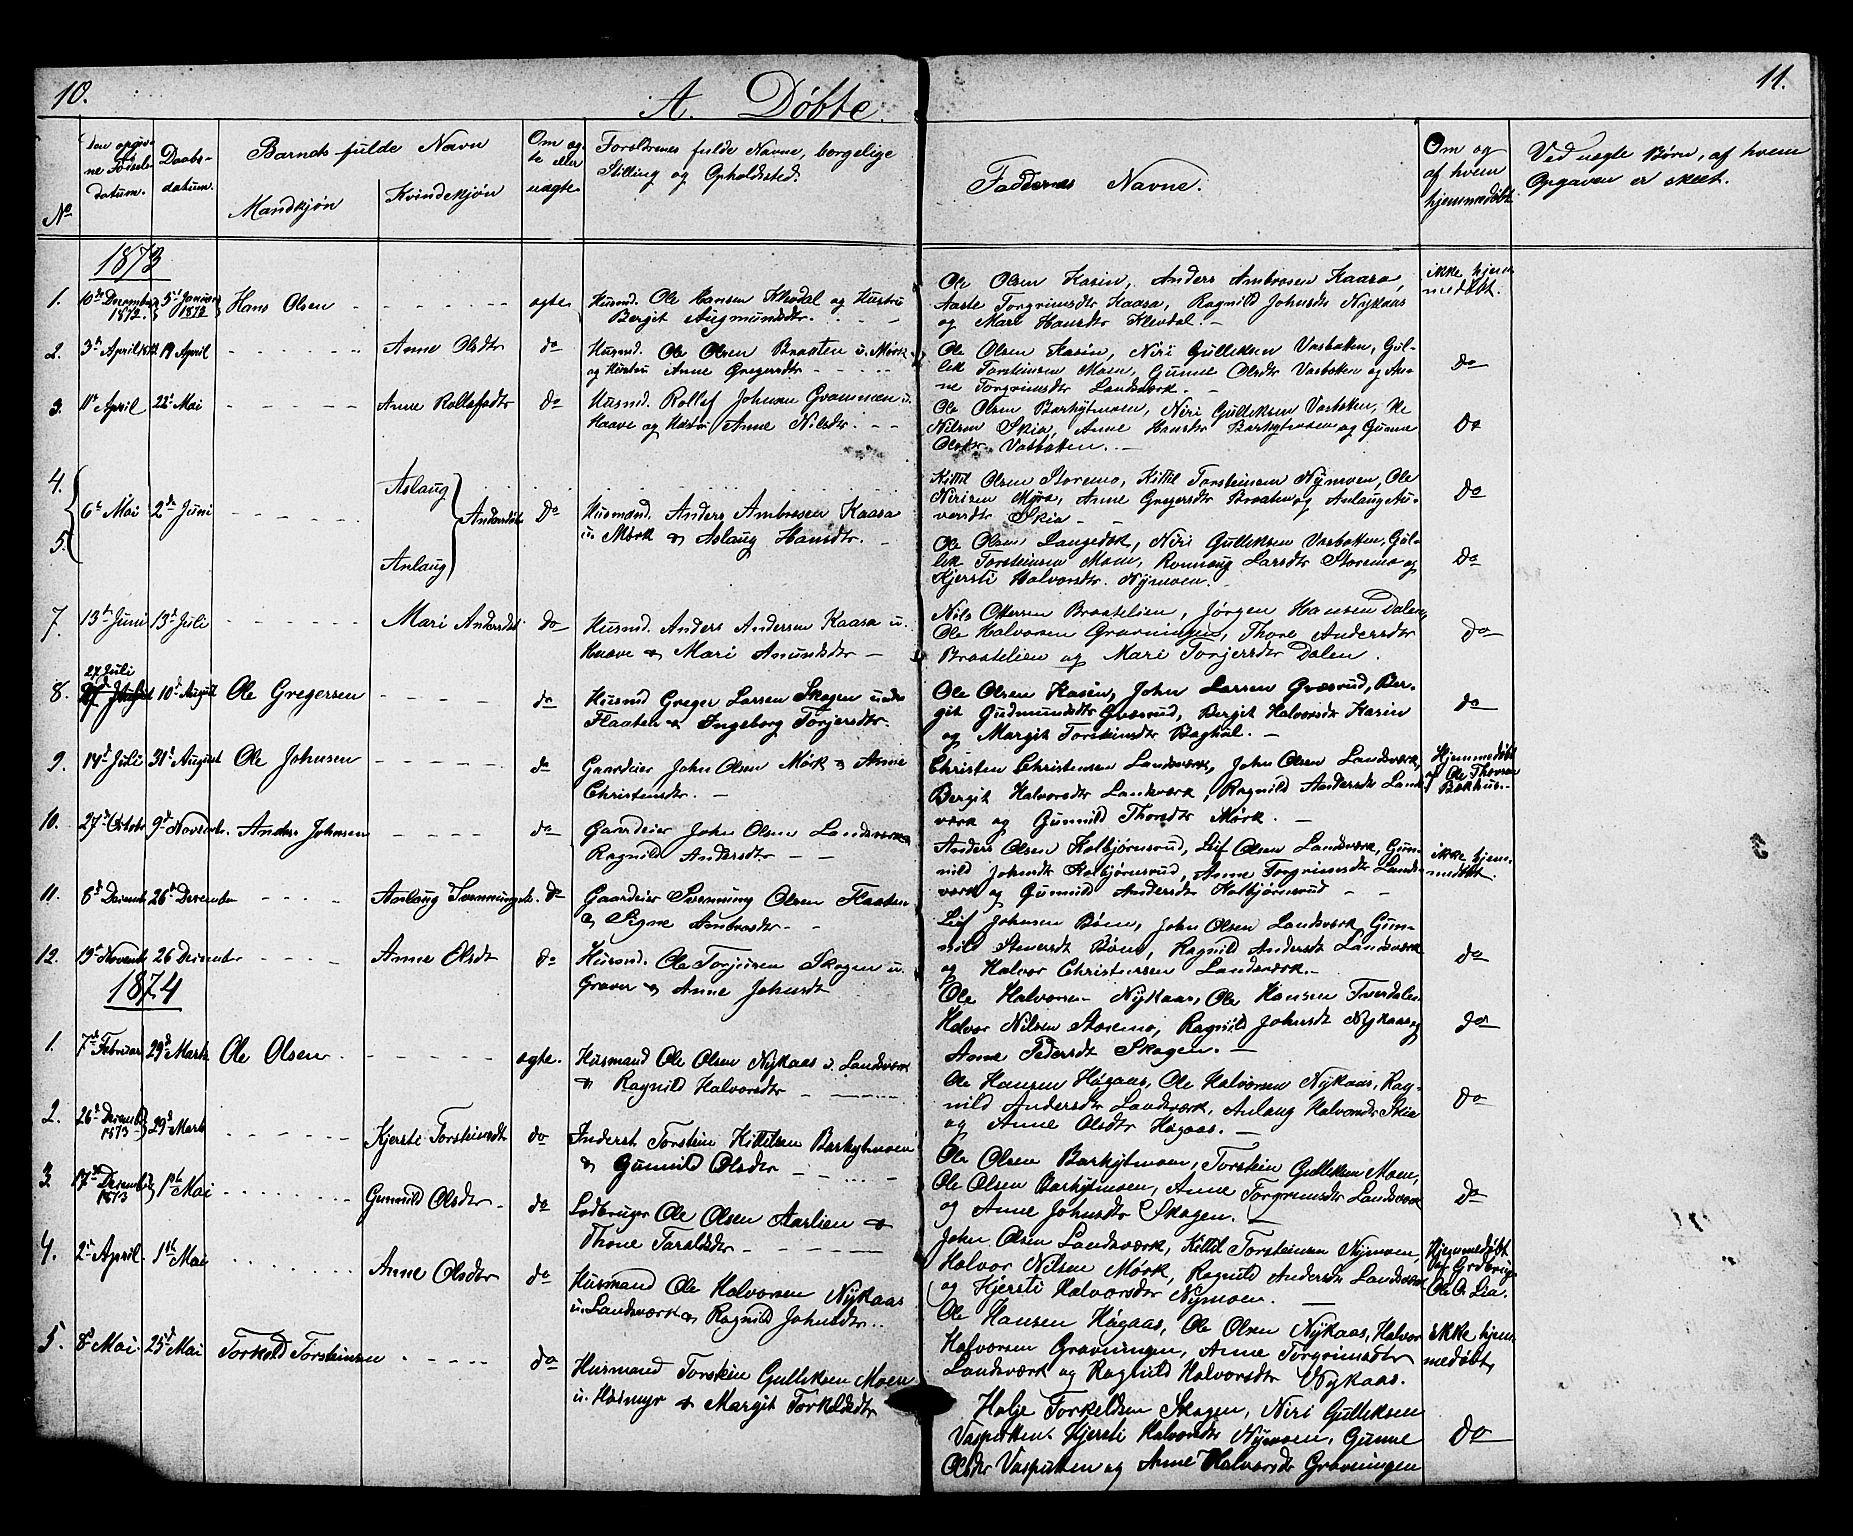 SAKO, Heddal kirkebøker, G/Gb/L0001: Klokkerbok nr. II 1, 1866-1887, s. 10-11